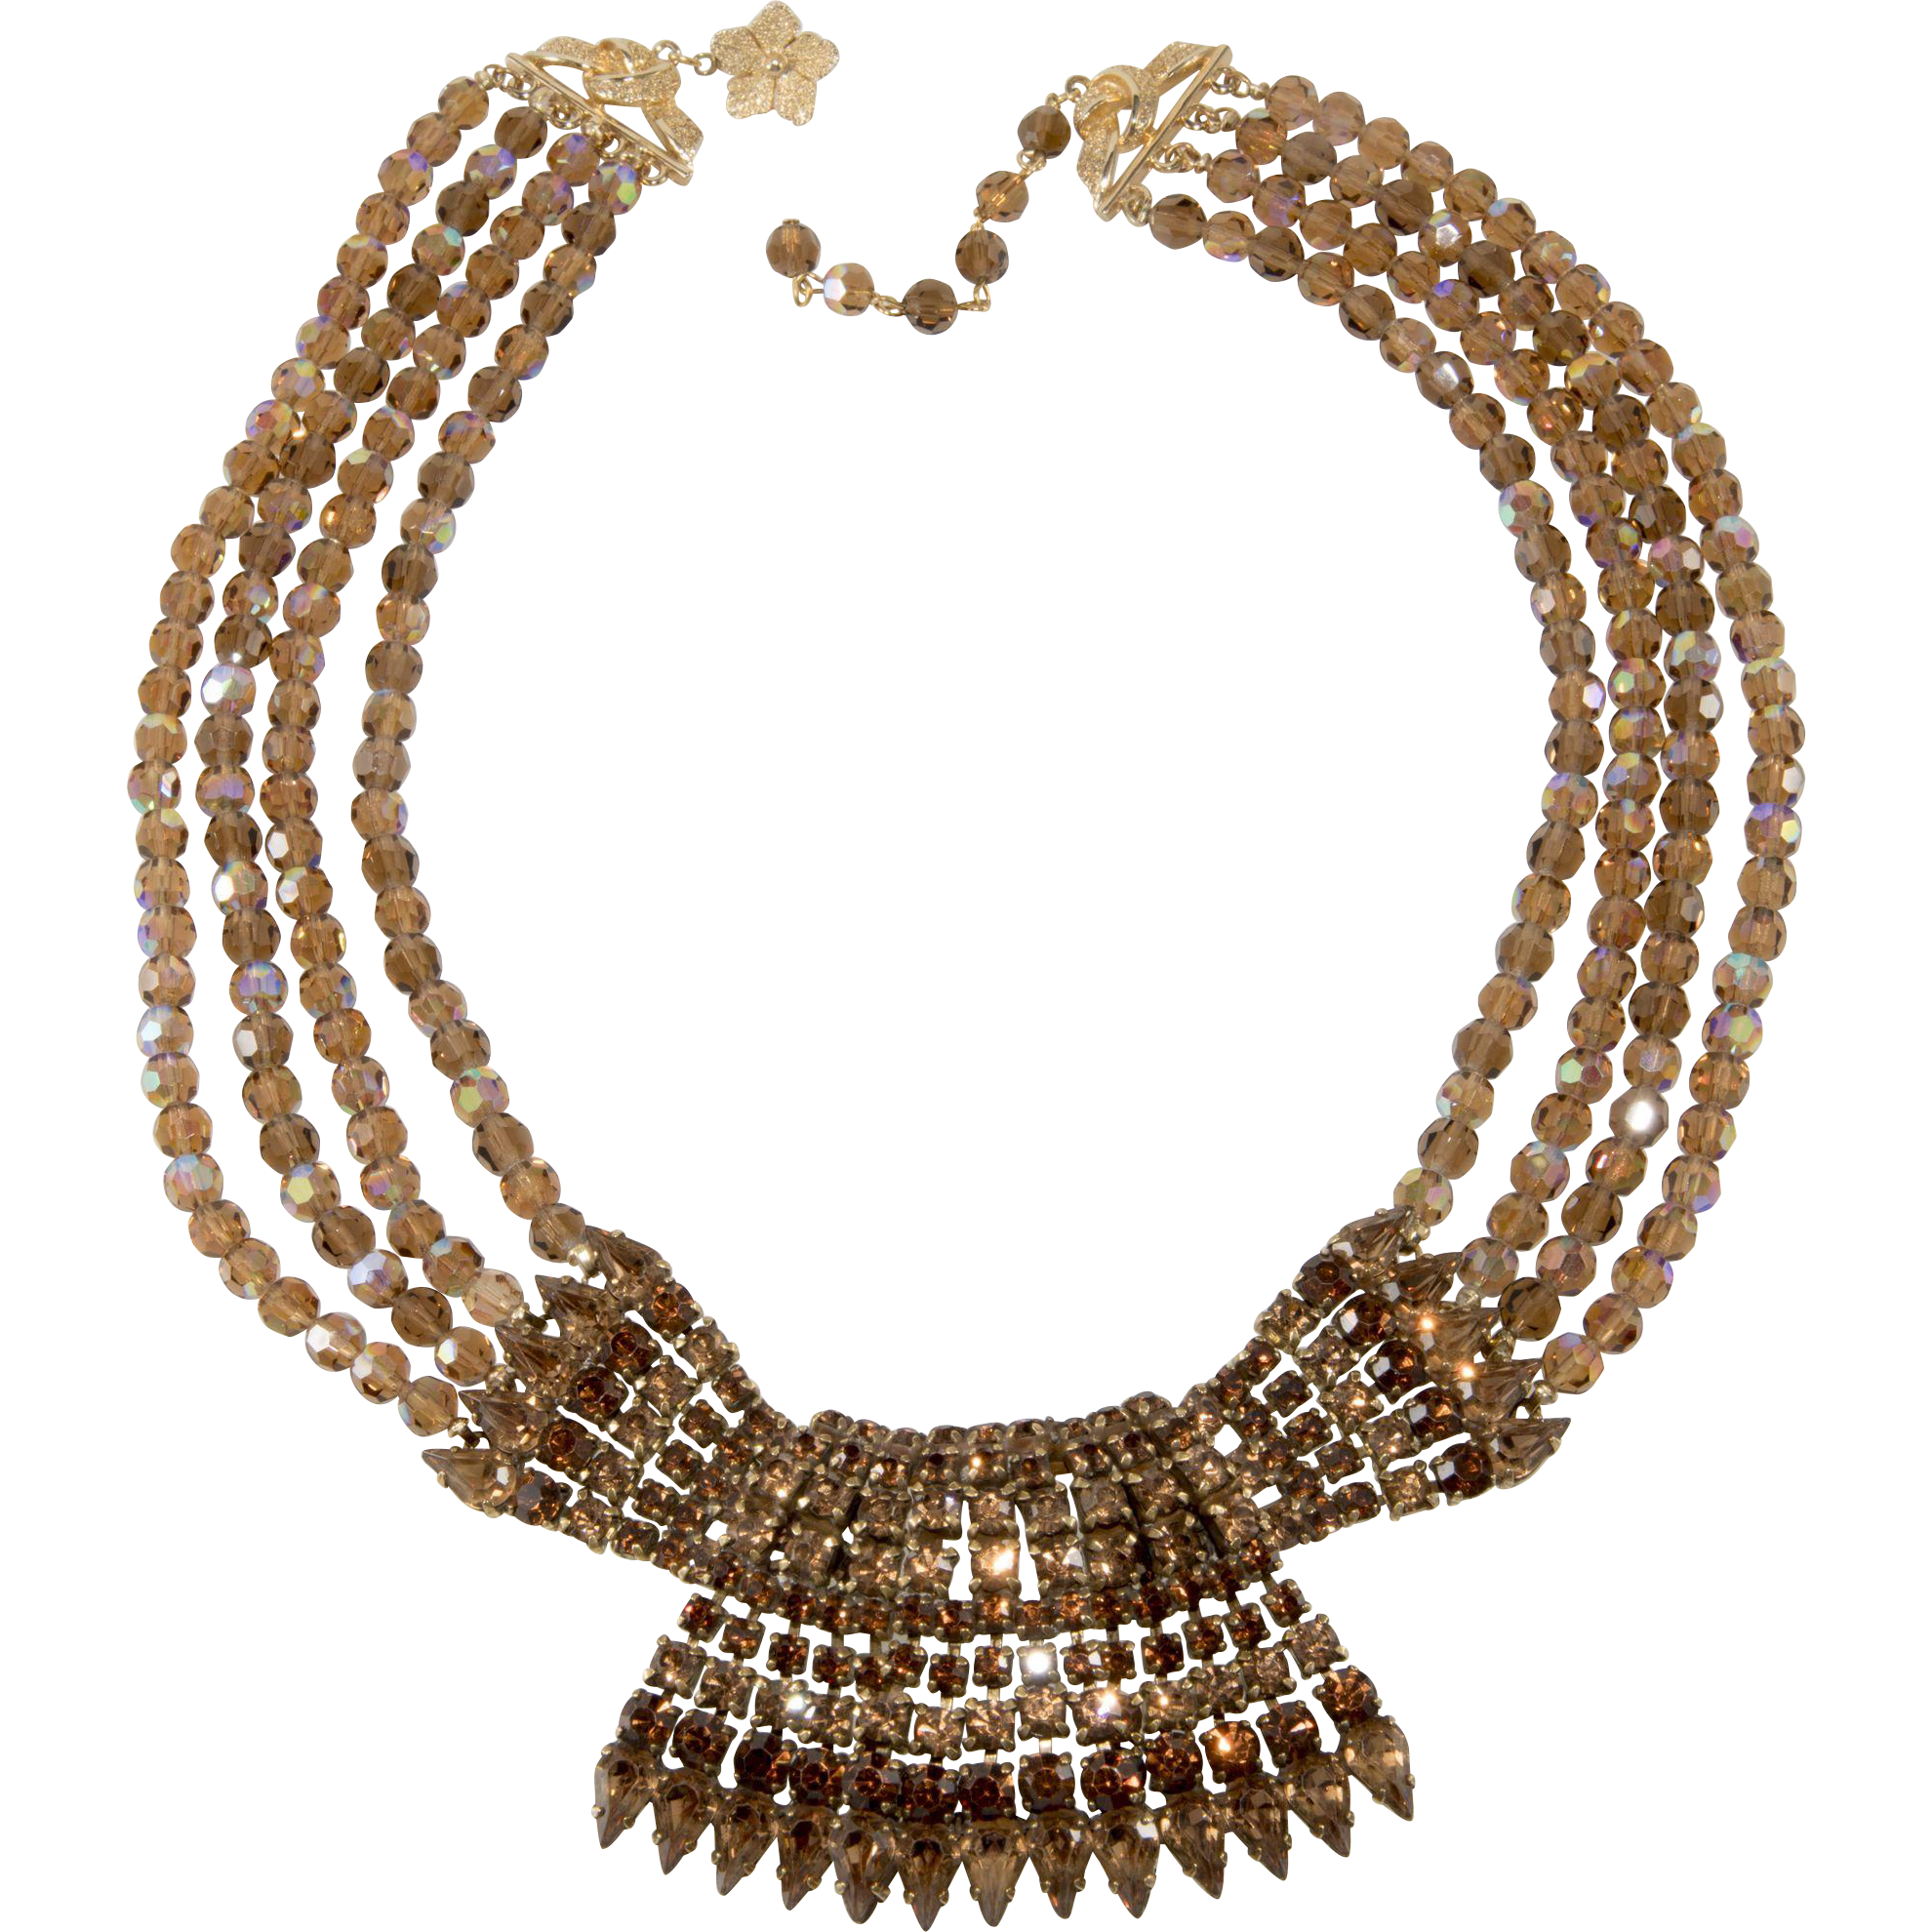 Vendome Necklace Prototype Brown Rhinestones and Beads Vintage